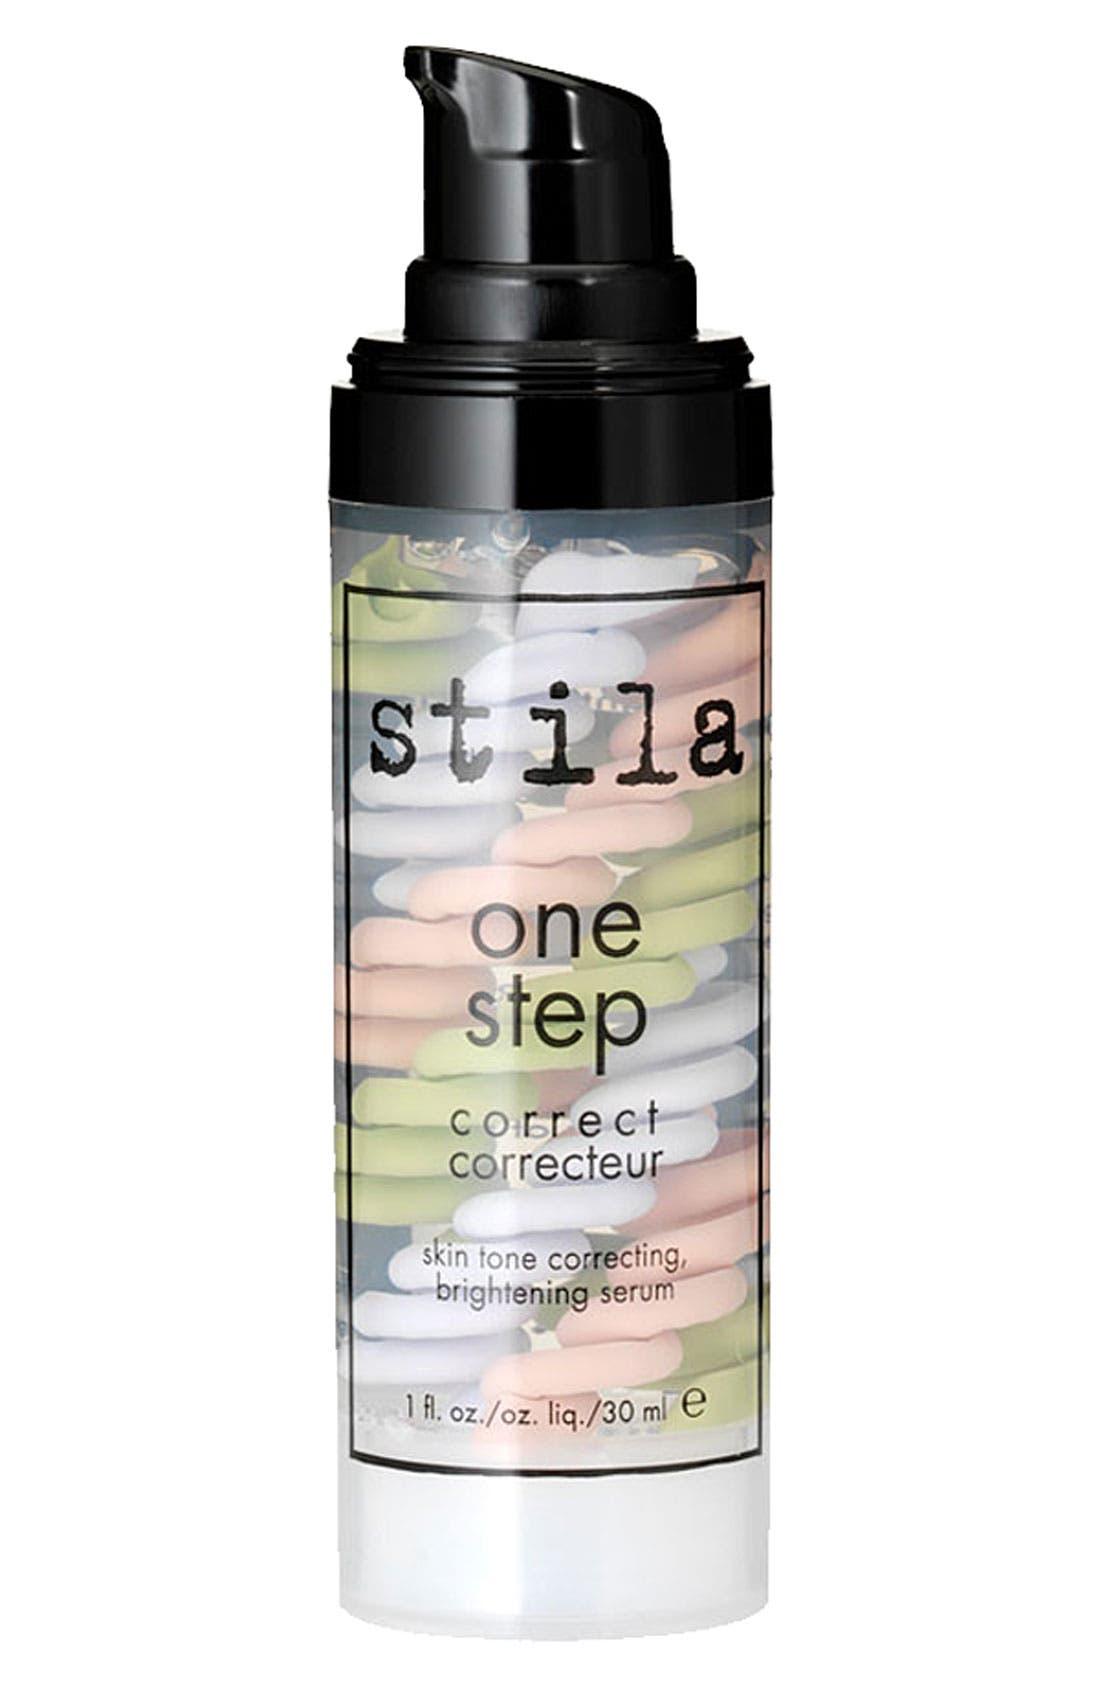 stila 'one step correct' skin tone correcting brightening serum